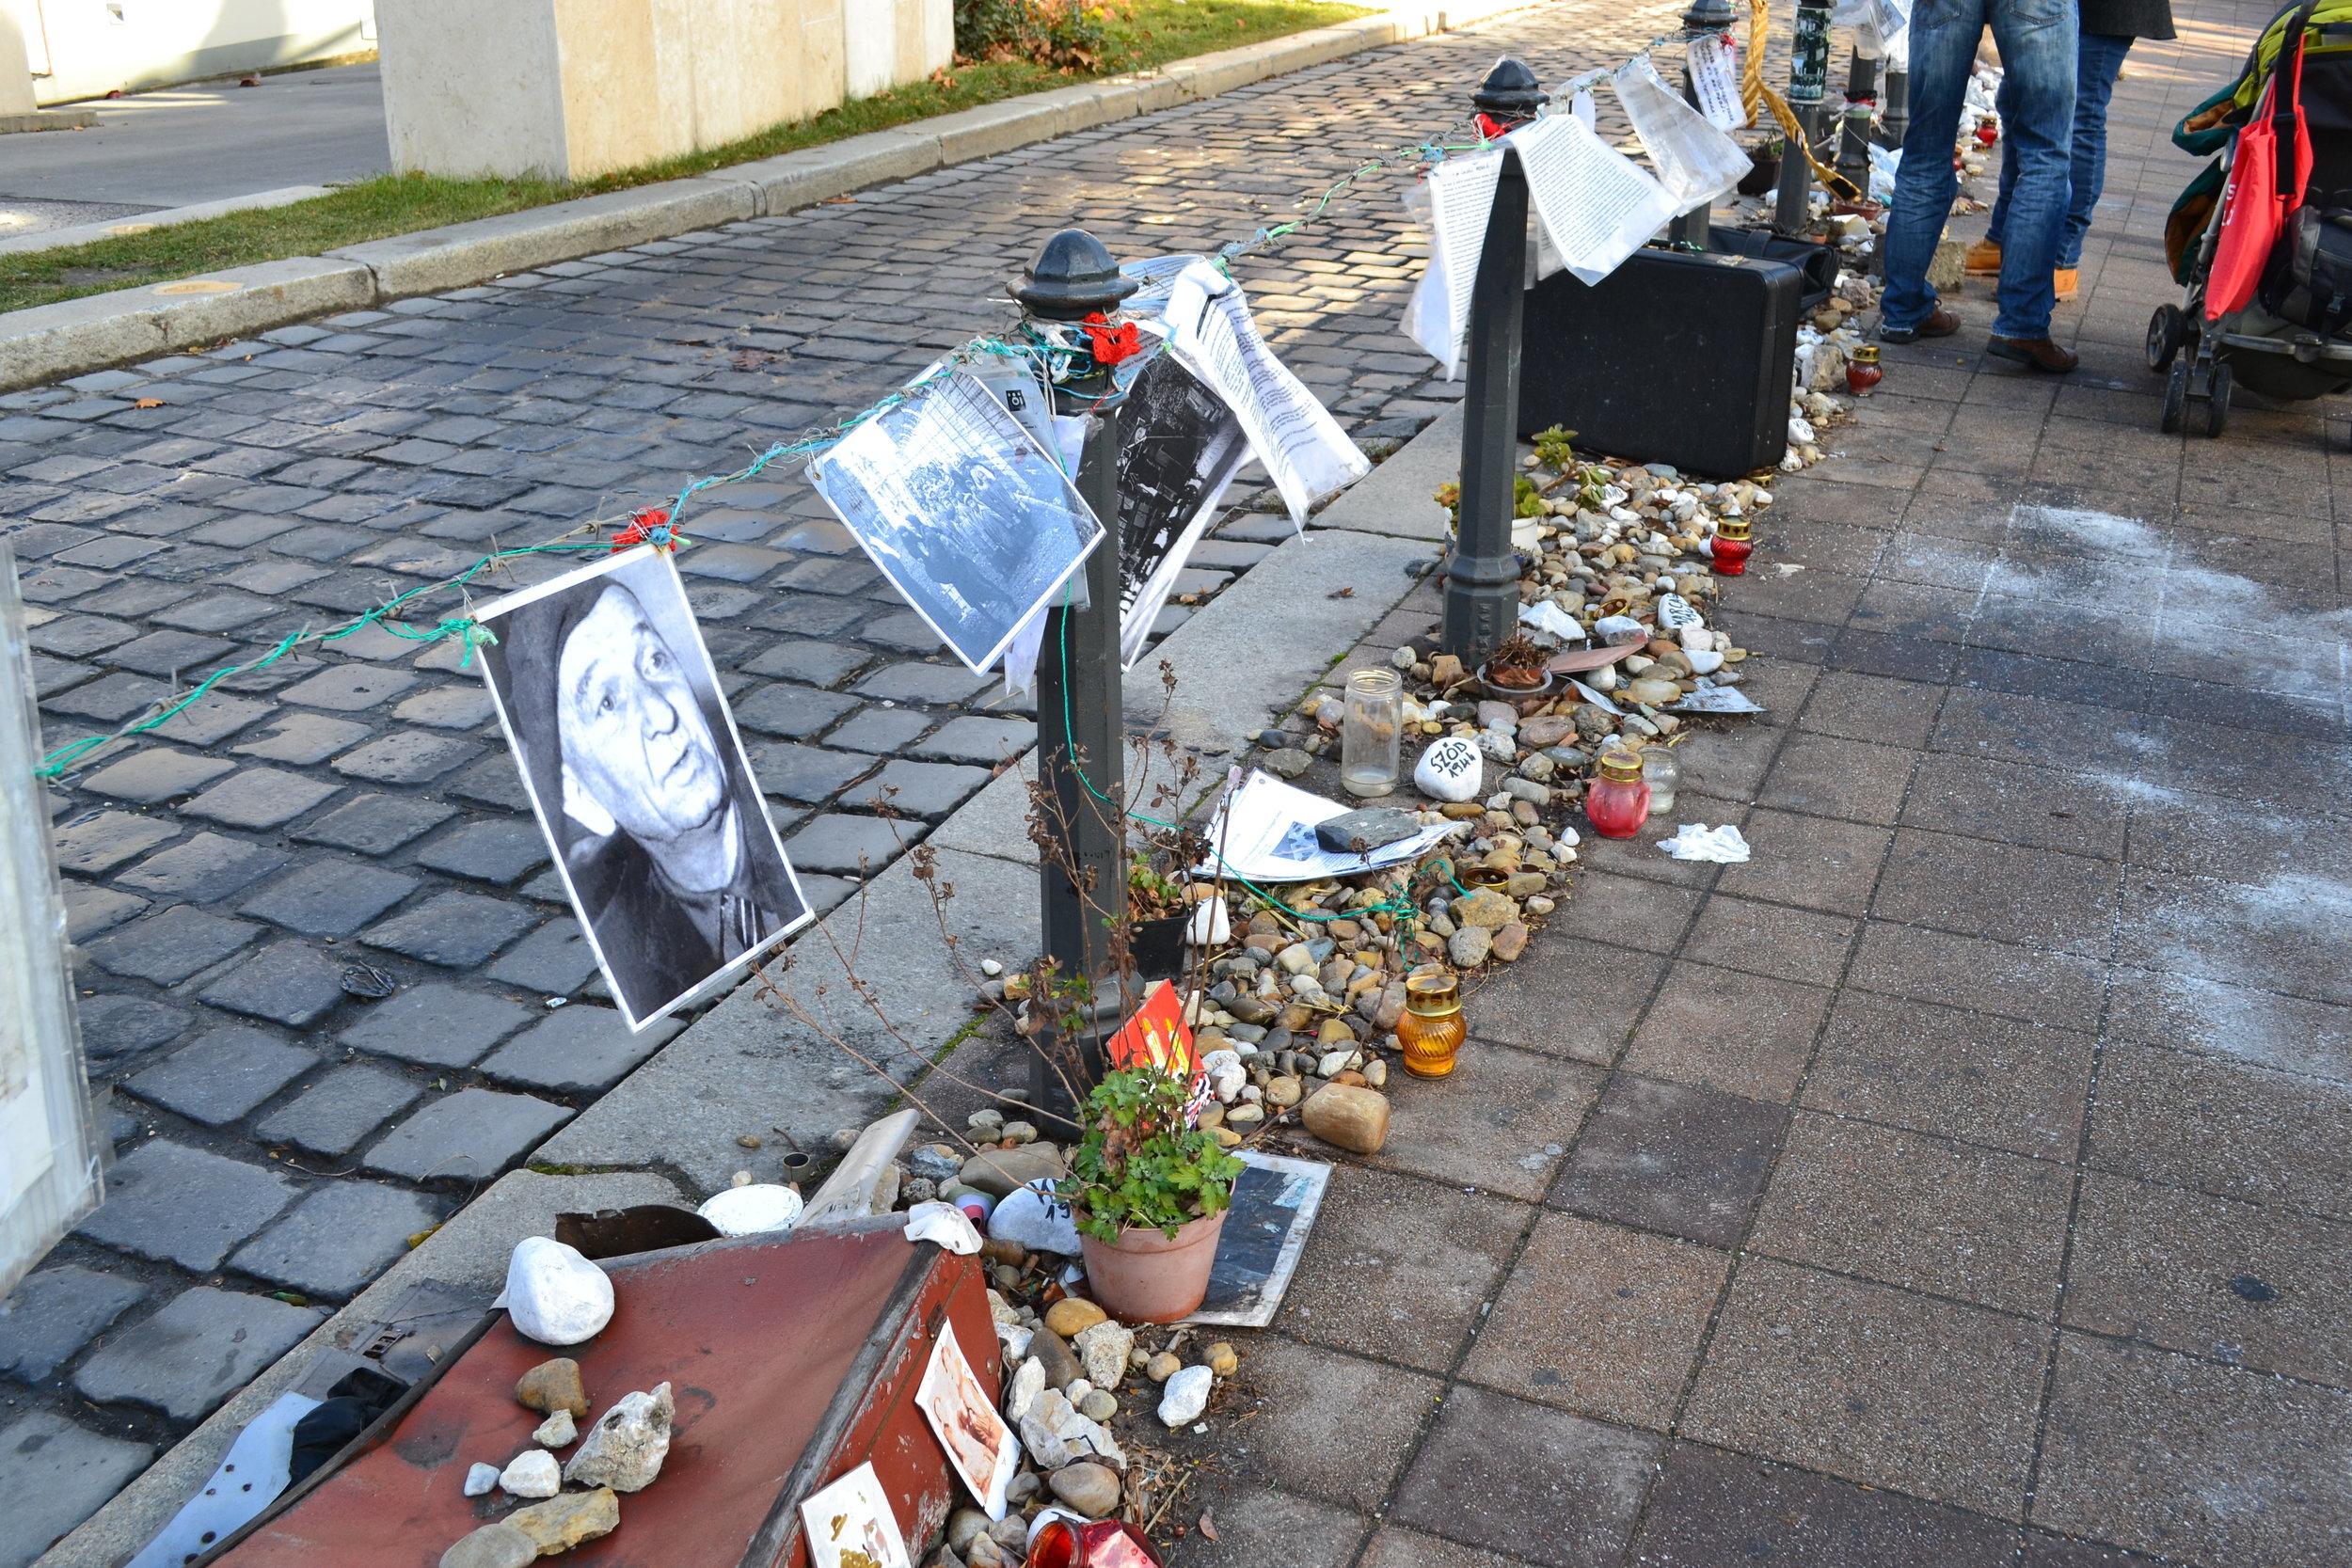 **WWII Monument in Liberty Square - Memorabilia of Holocaust victims